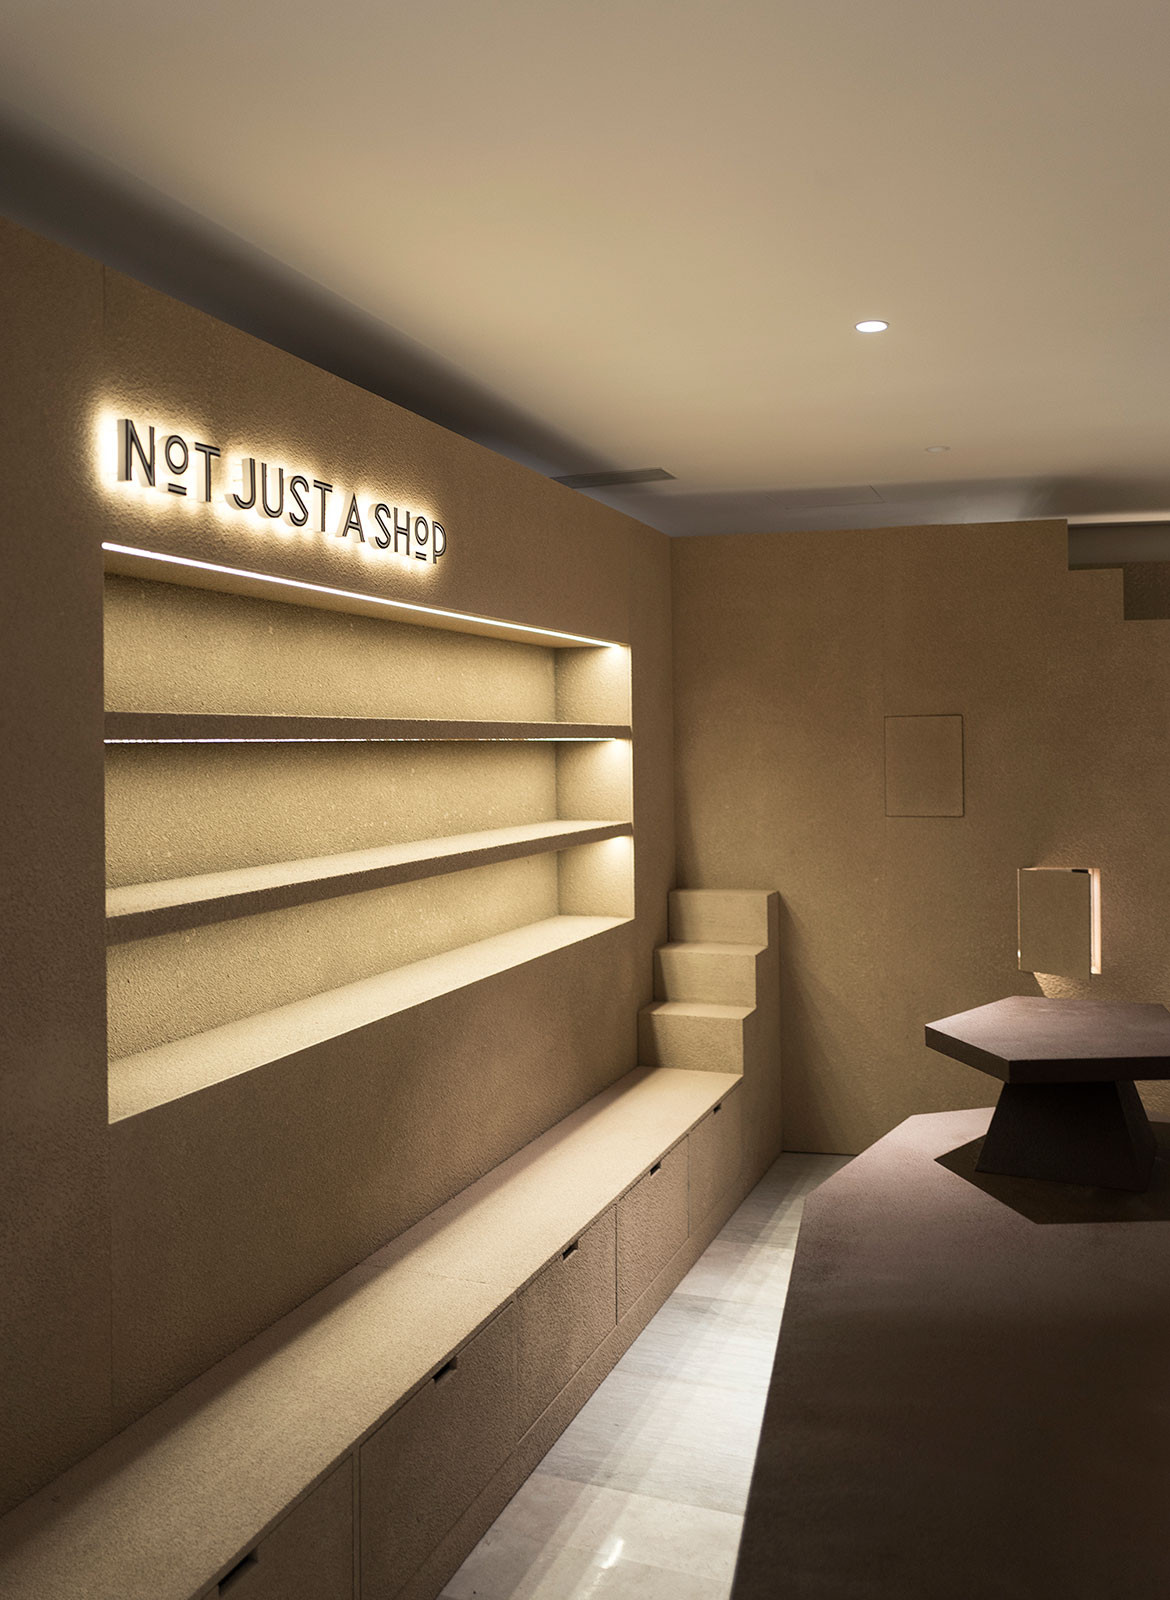 Not Just another Store Yatofu Creatives CC Sheen Tao lighting